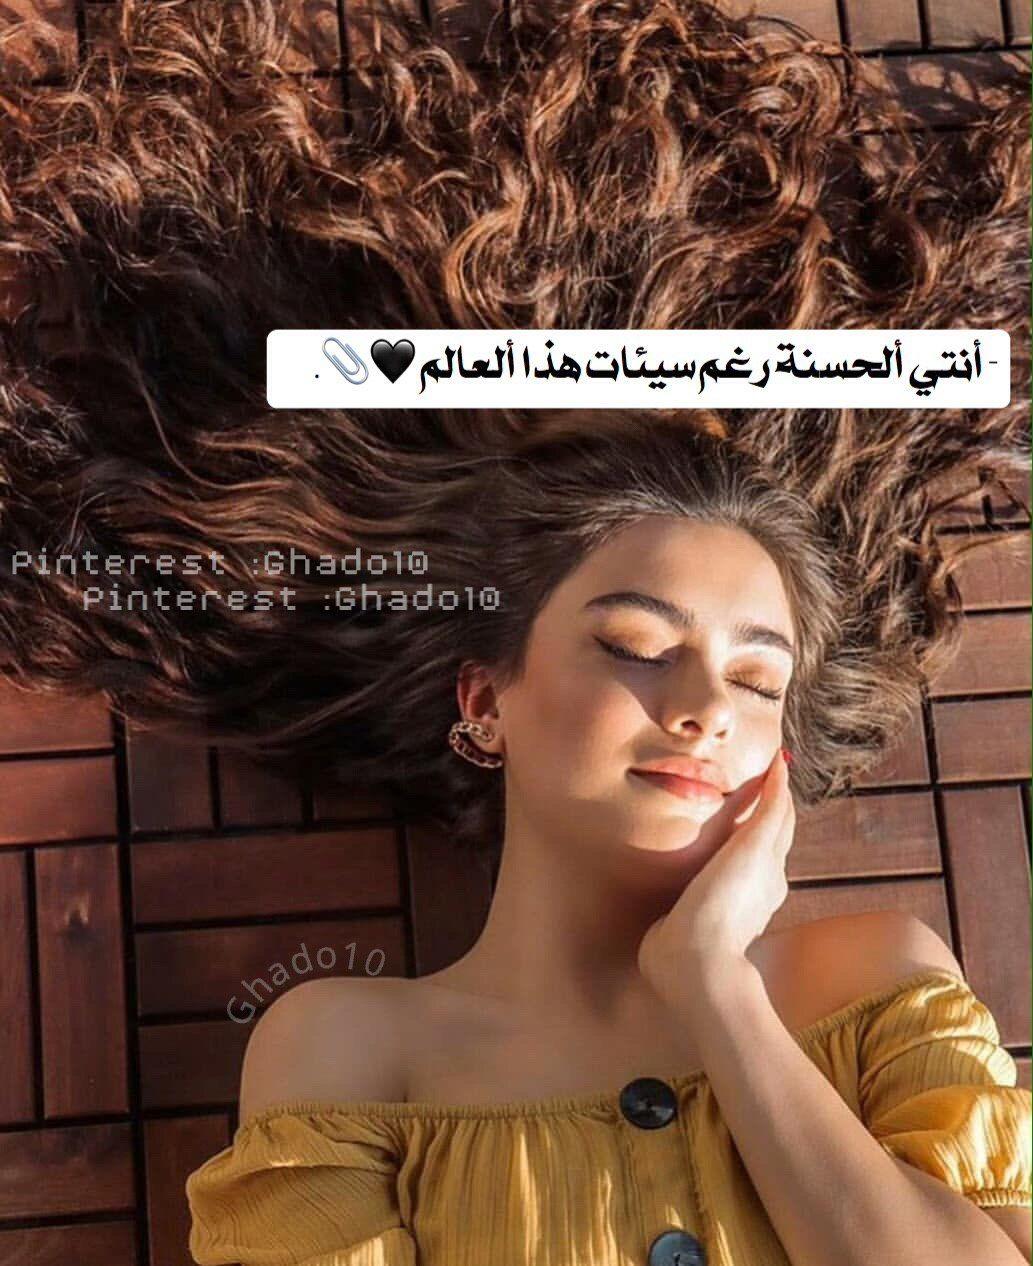 اكسبلور اقتباسات رمزيات حب العراق السعودية الامارات الخليج اطفال ایران Explo Calligraphy Quotes Love Beautiful Girl Photo Fashion Photography Poses